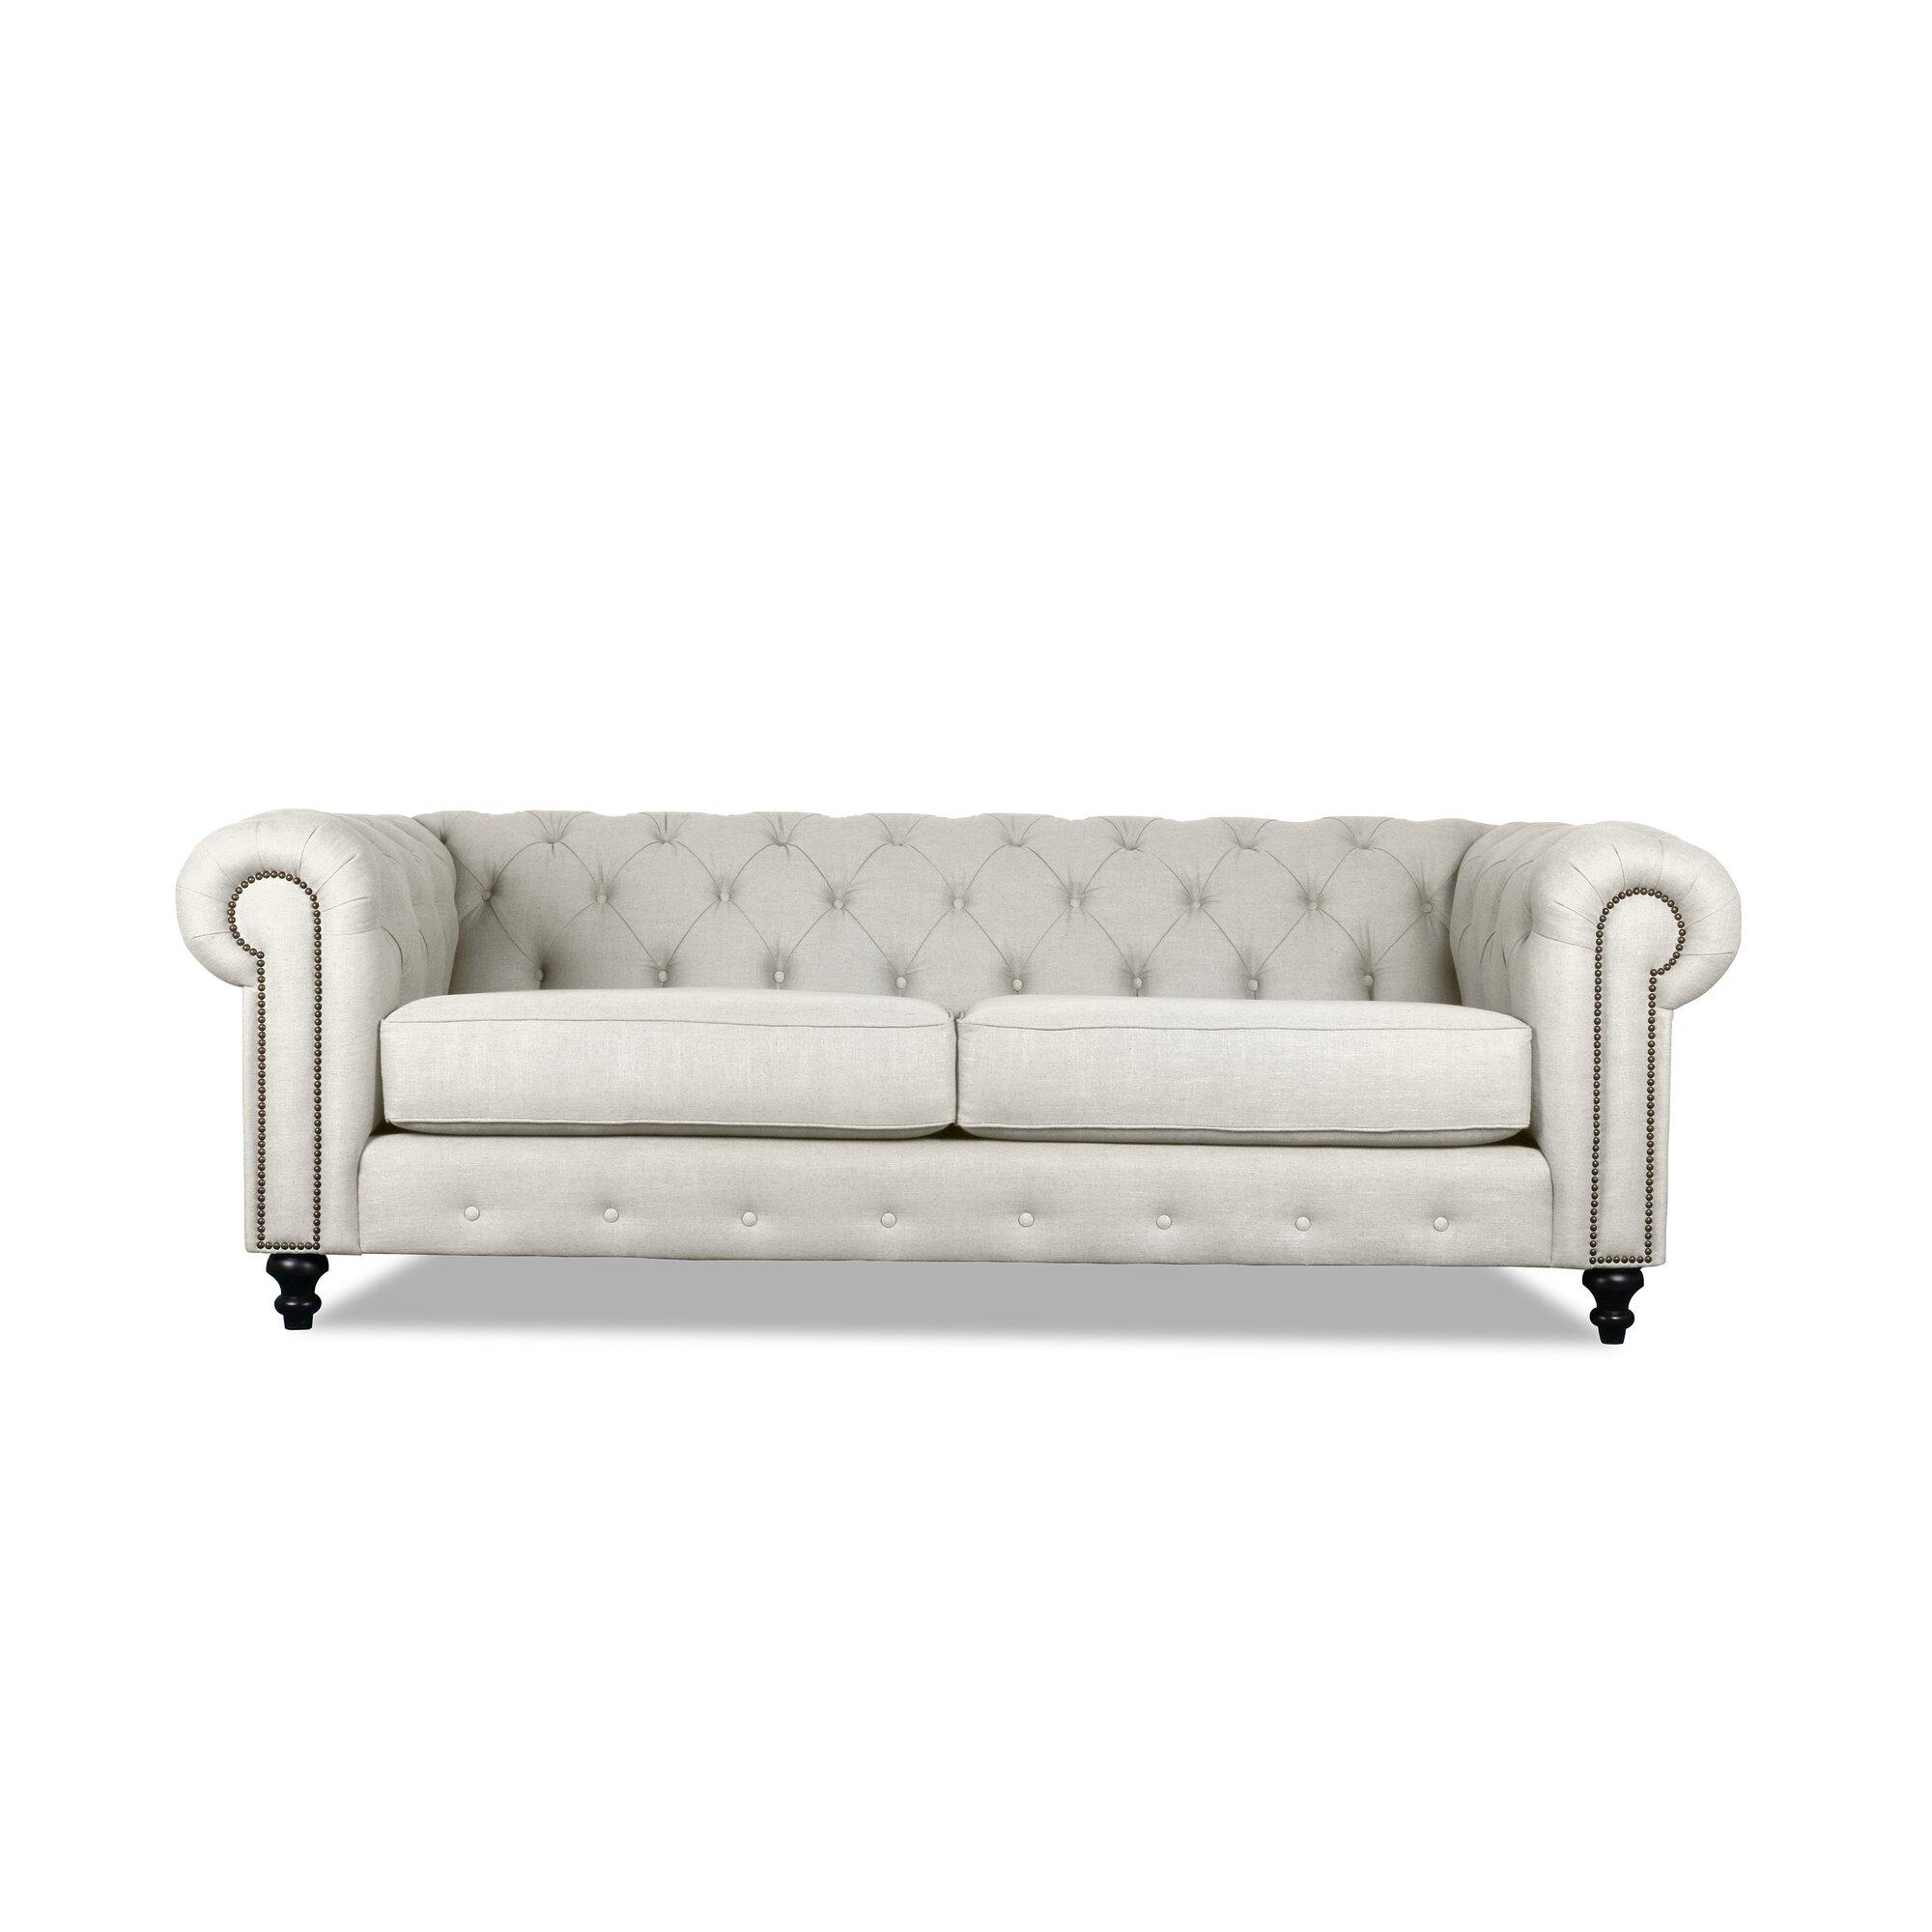 Chesterfield White Sofa Instasofa